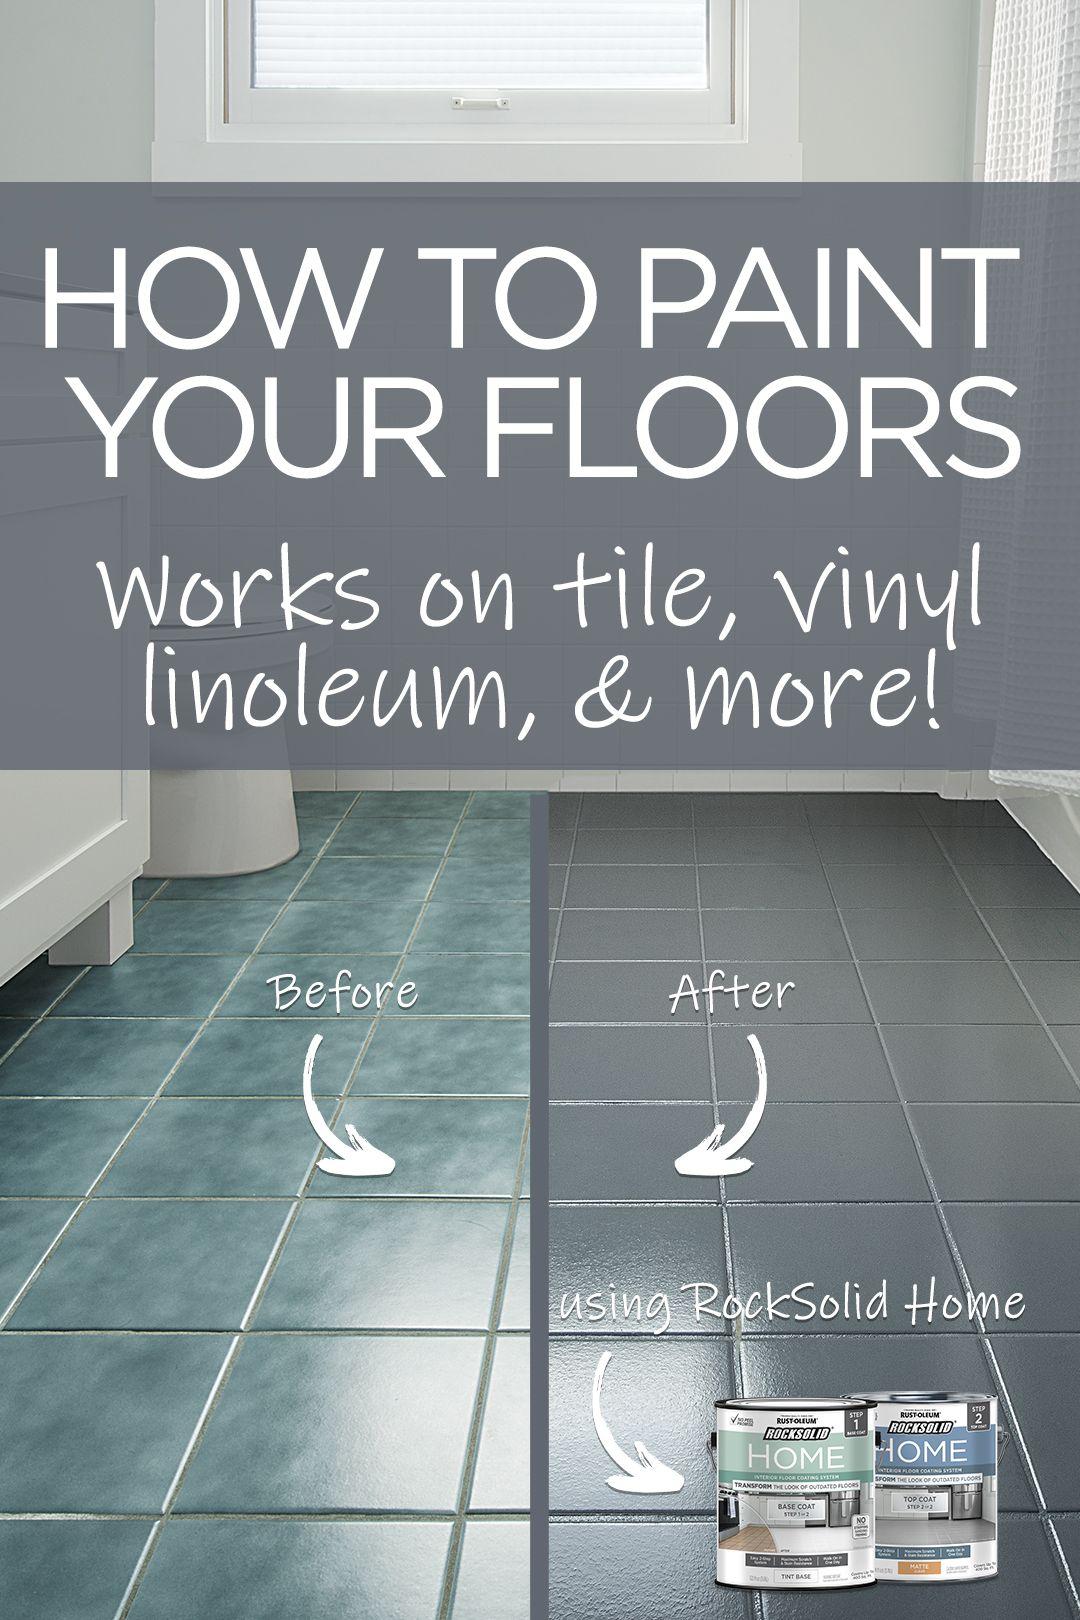 Rust-Oleum® Home | How To Paint A Floor | Rust-Oleum - Home Decor